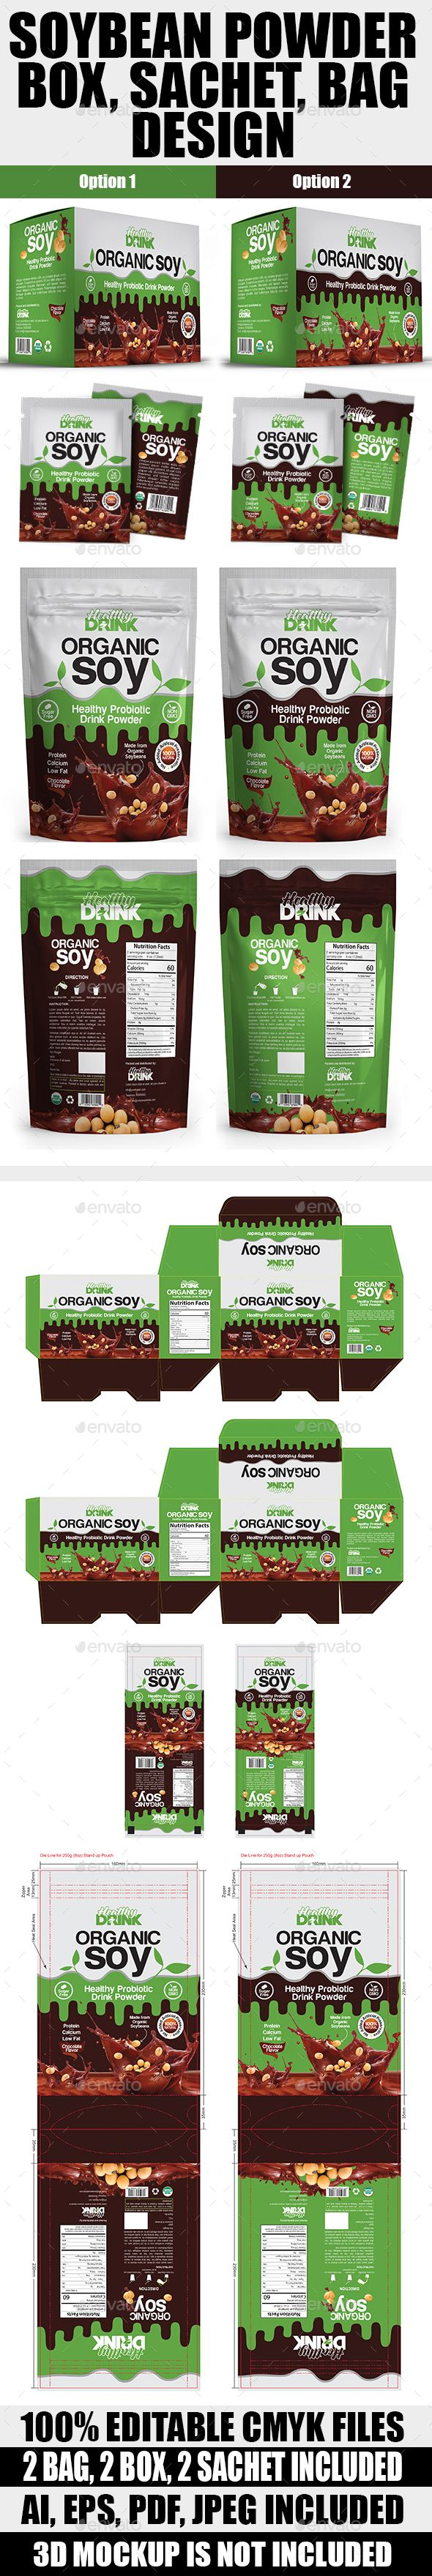 Soybean Drink Powder Bag, Box & Sachet